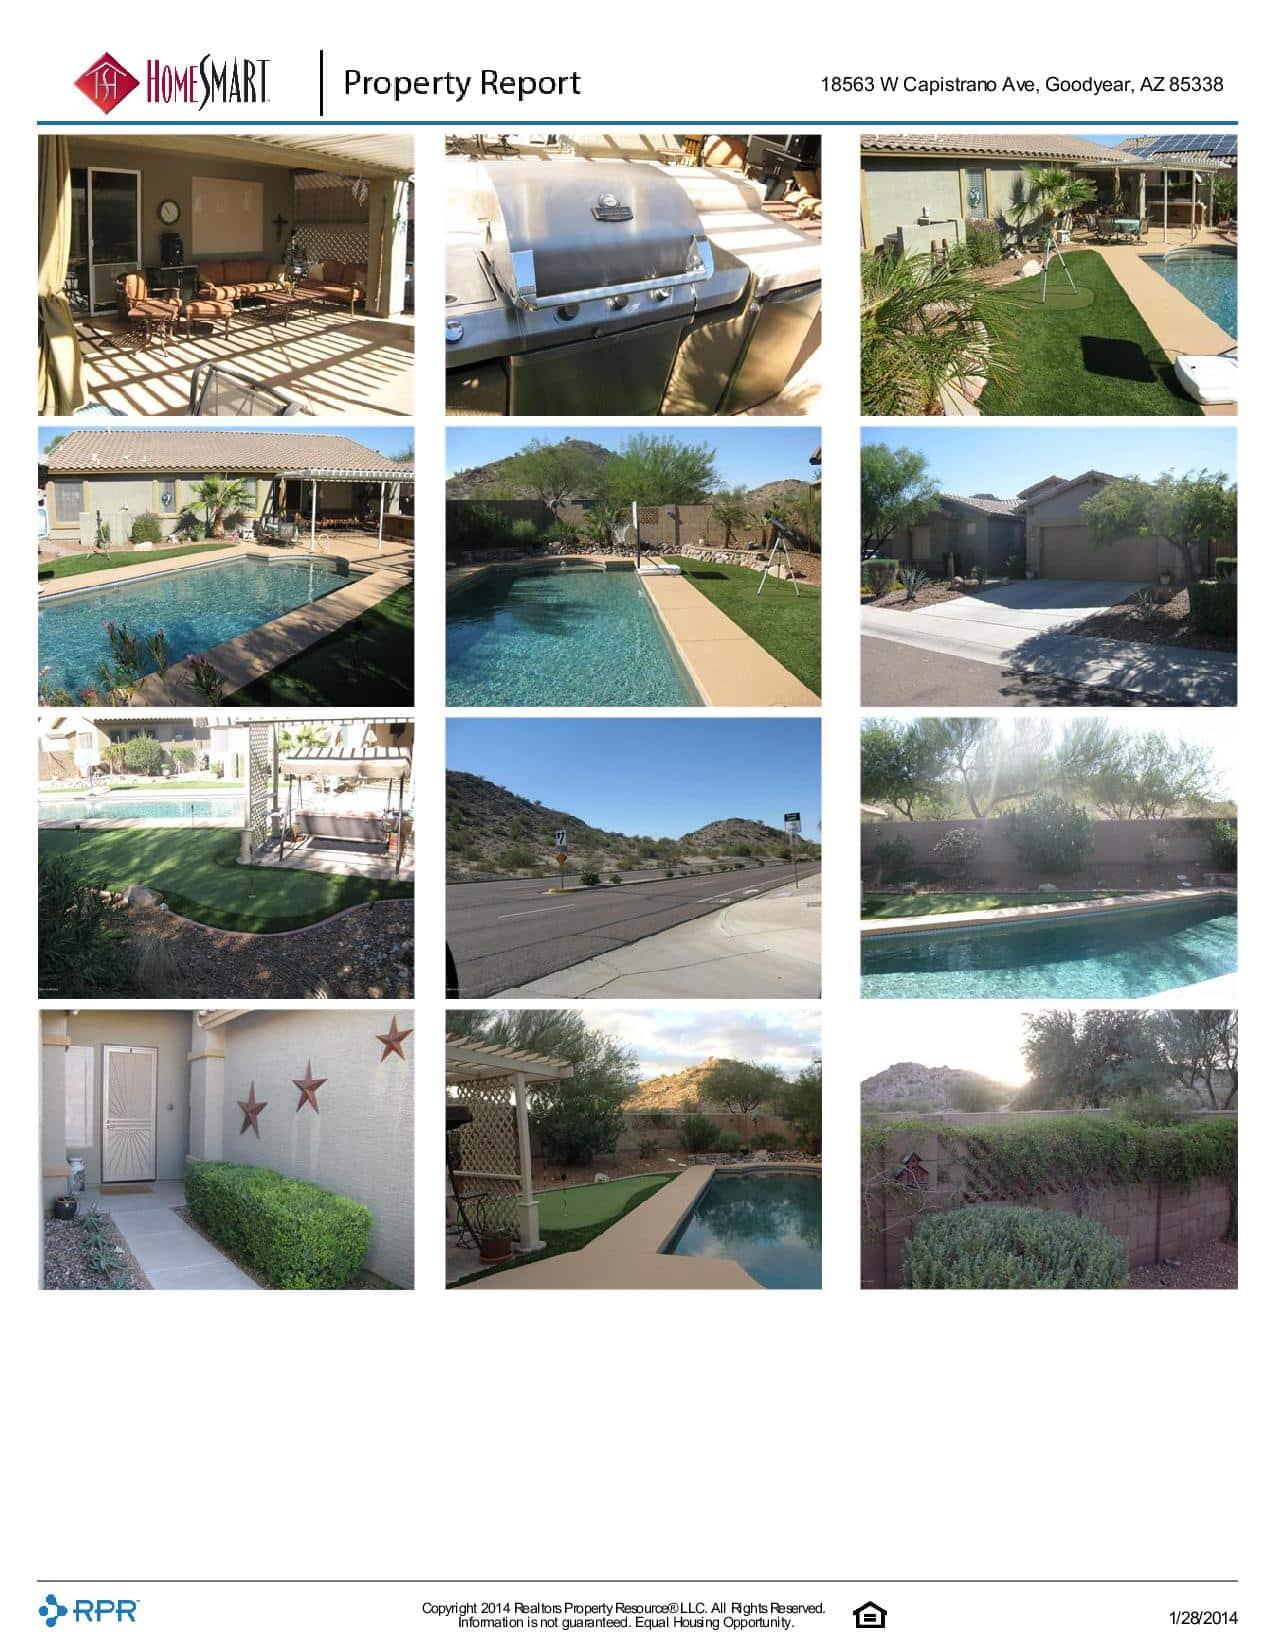 18563-W-Capistrano-Ave-Goodyear-AZ-85338.pdf-page-006